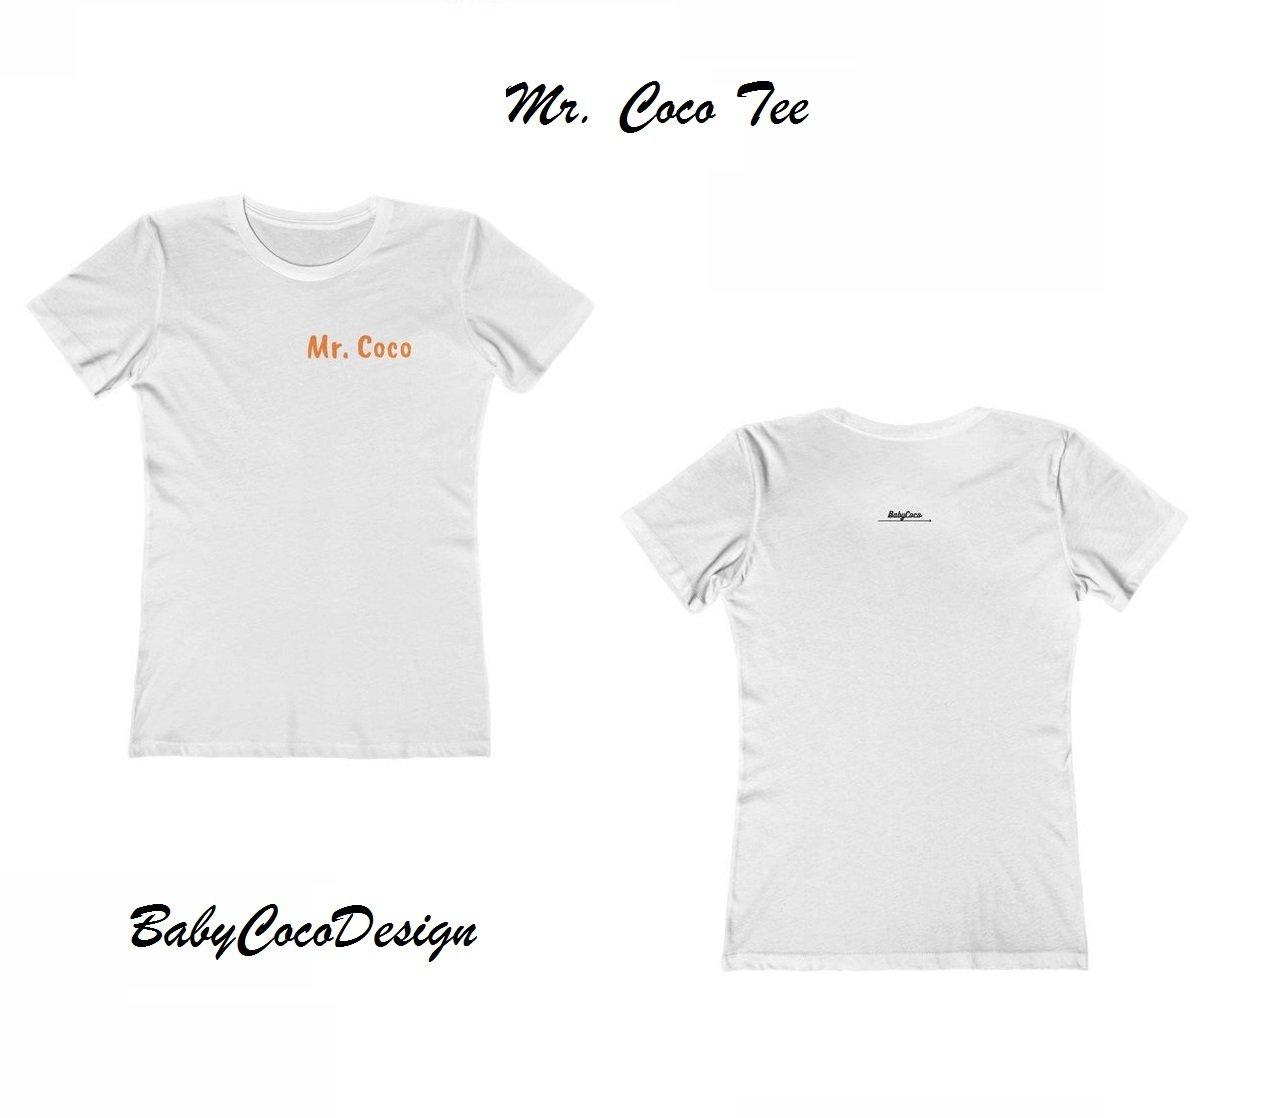 BabyCocoDesign Mr. Coco Tee Shirt - White / Orange, Size XL